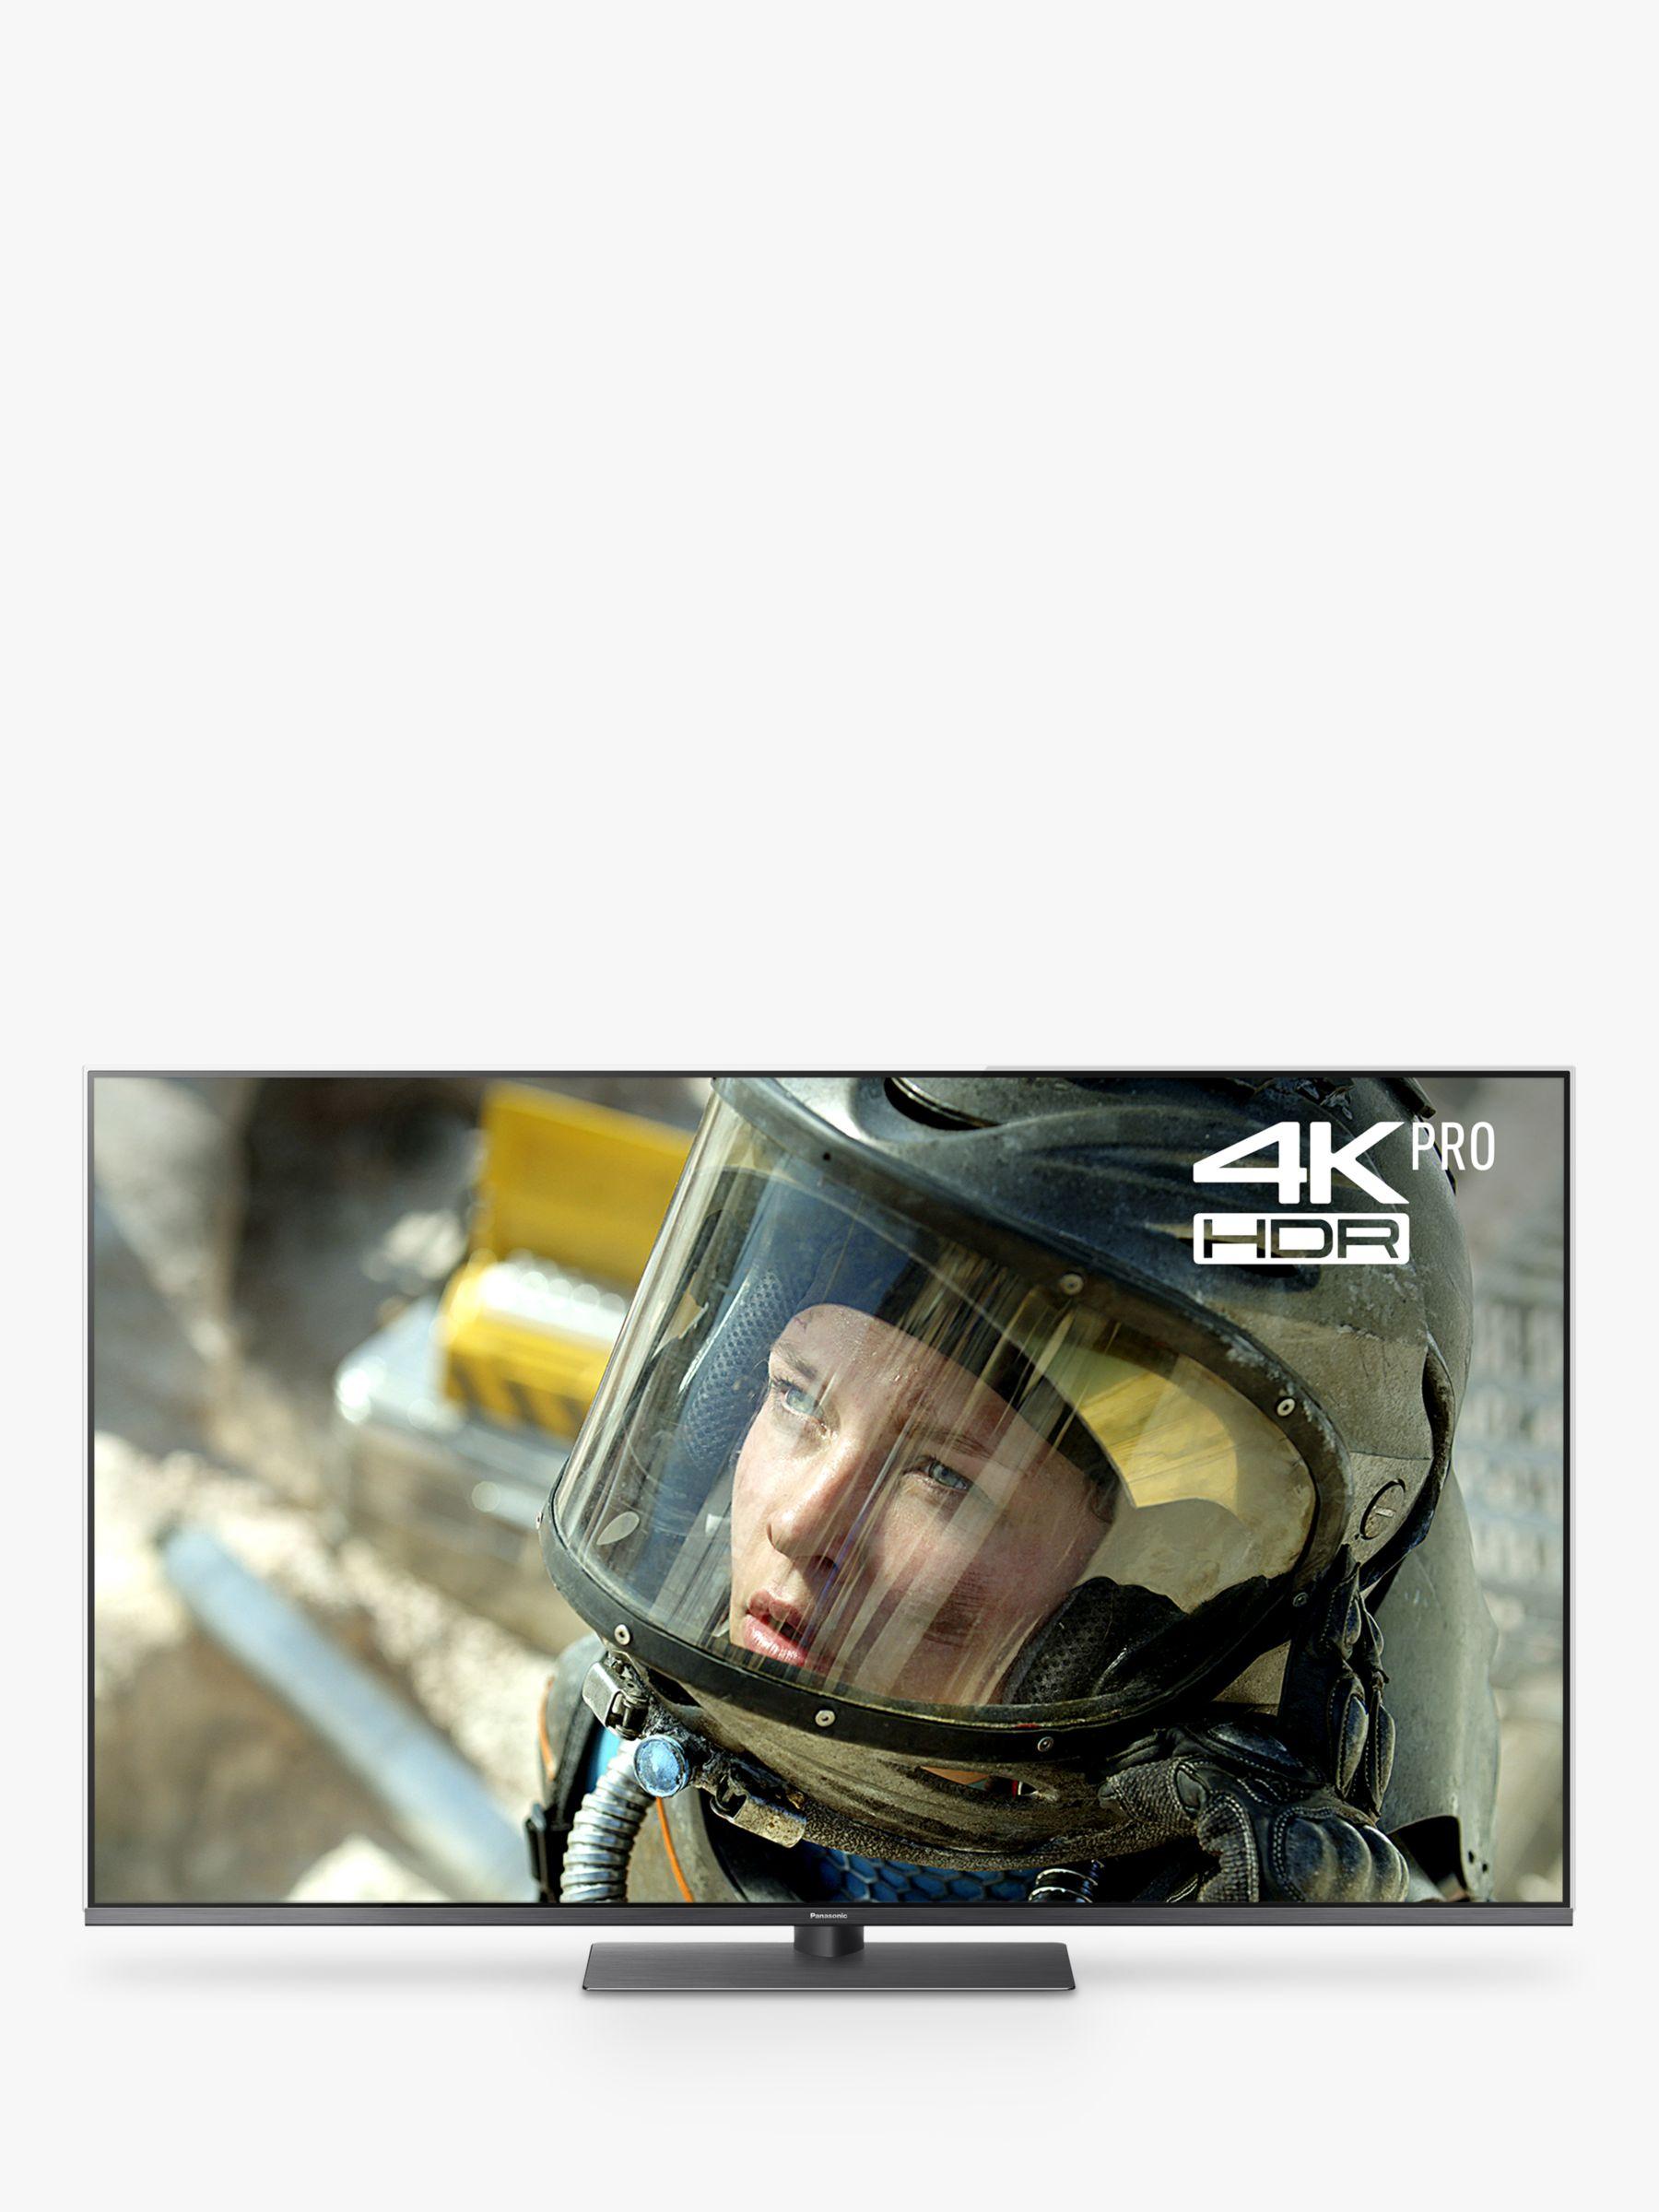 Panasonic TX-49FX750B LED HDR 4K Ultra HD Smart TV, 49